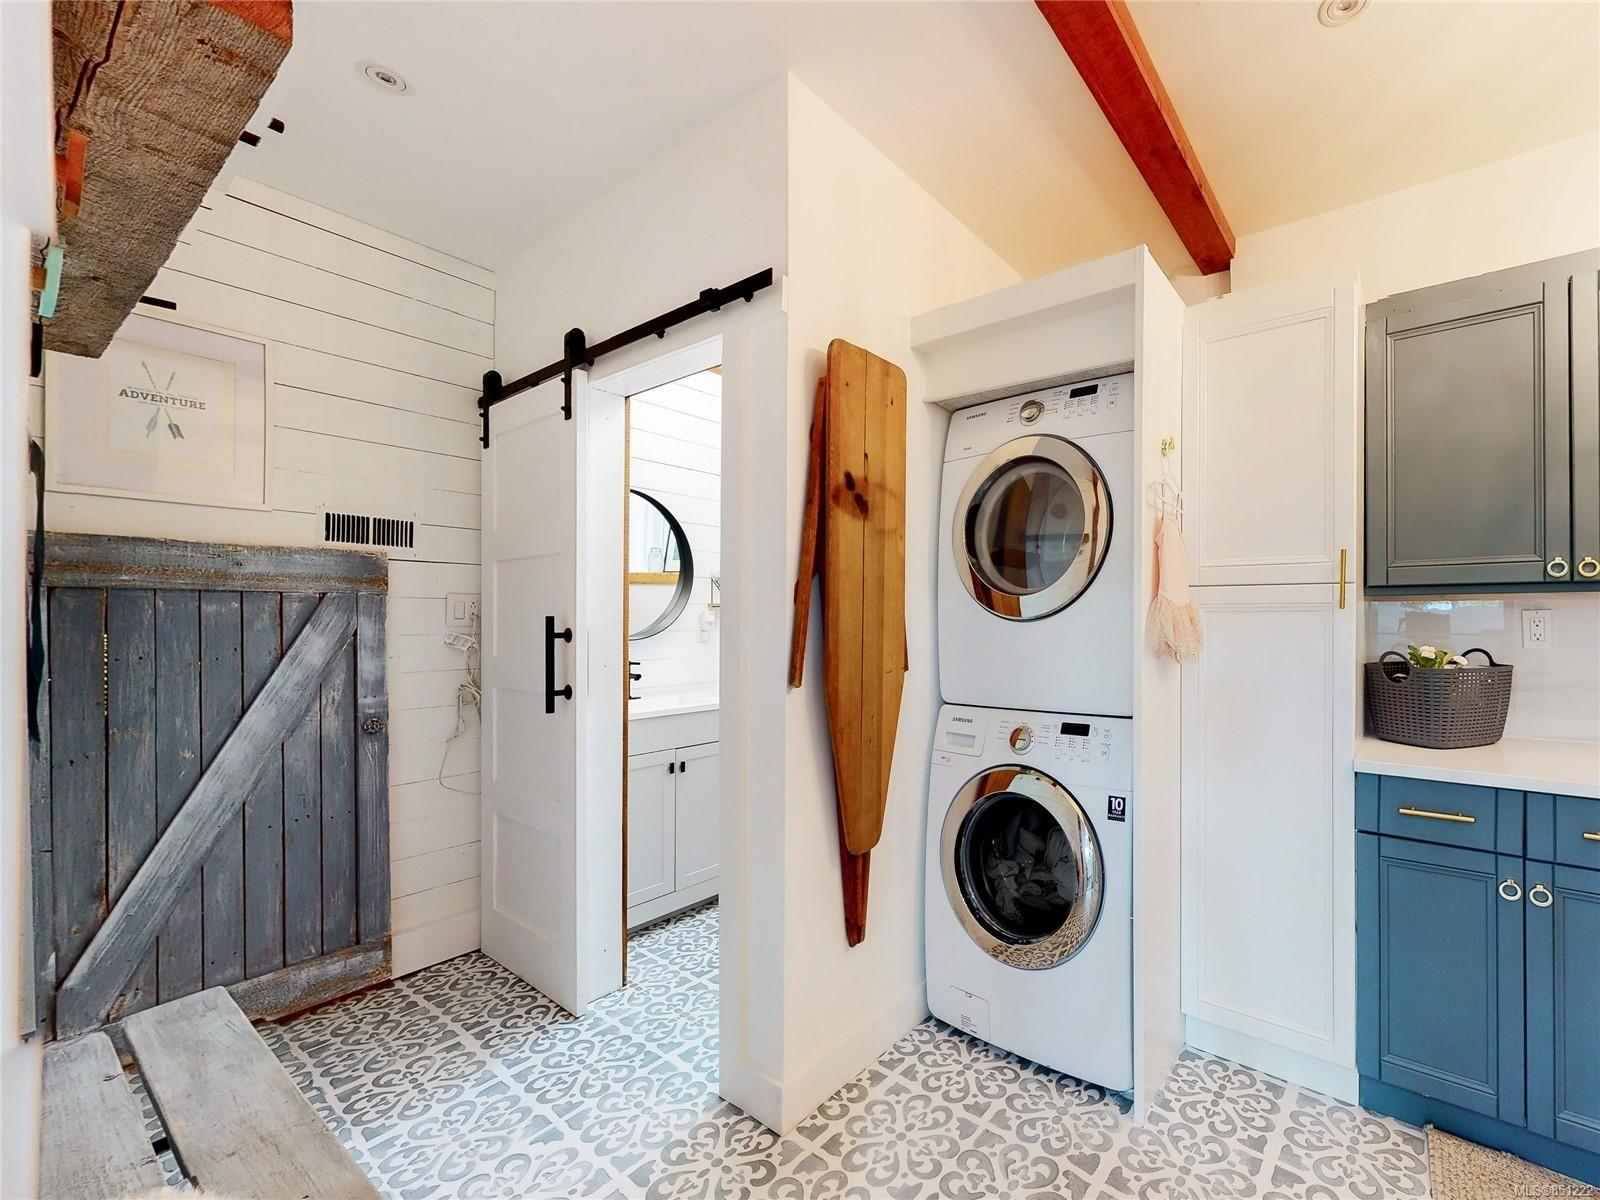 Photo 24: Photos: 2525 11th Ave in : PA Port Alberni House for sale (Port Alberni)  : MLS®# 851222